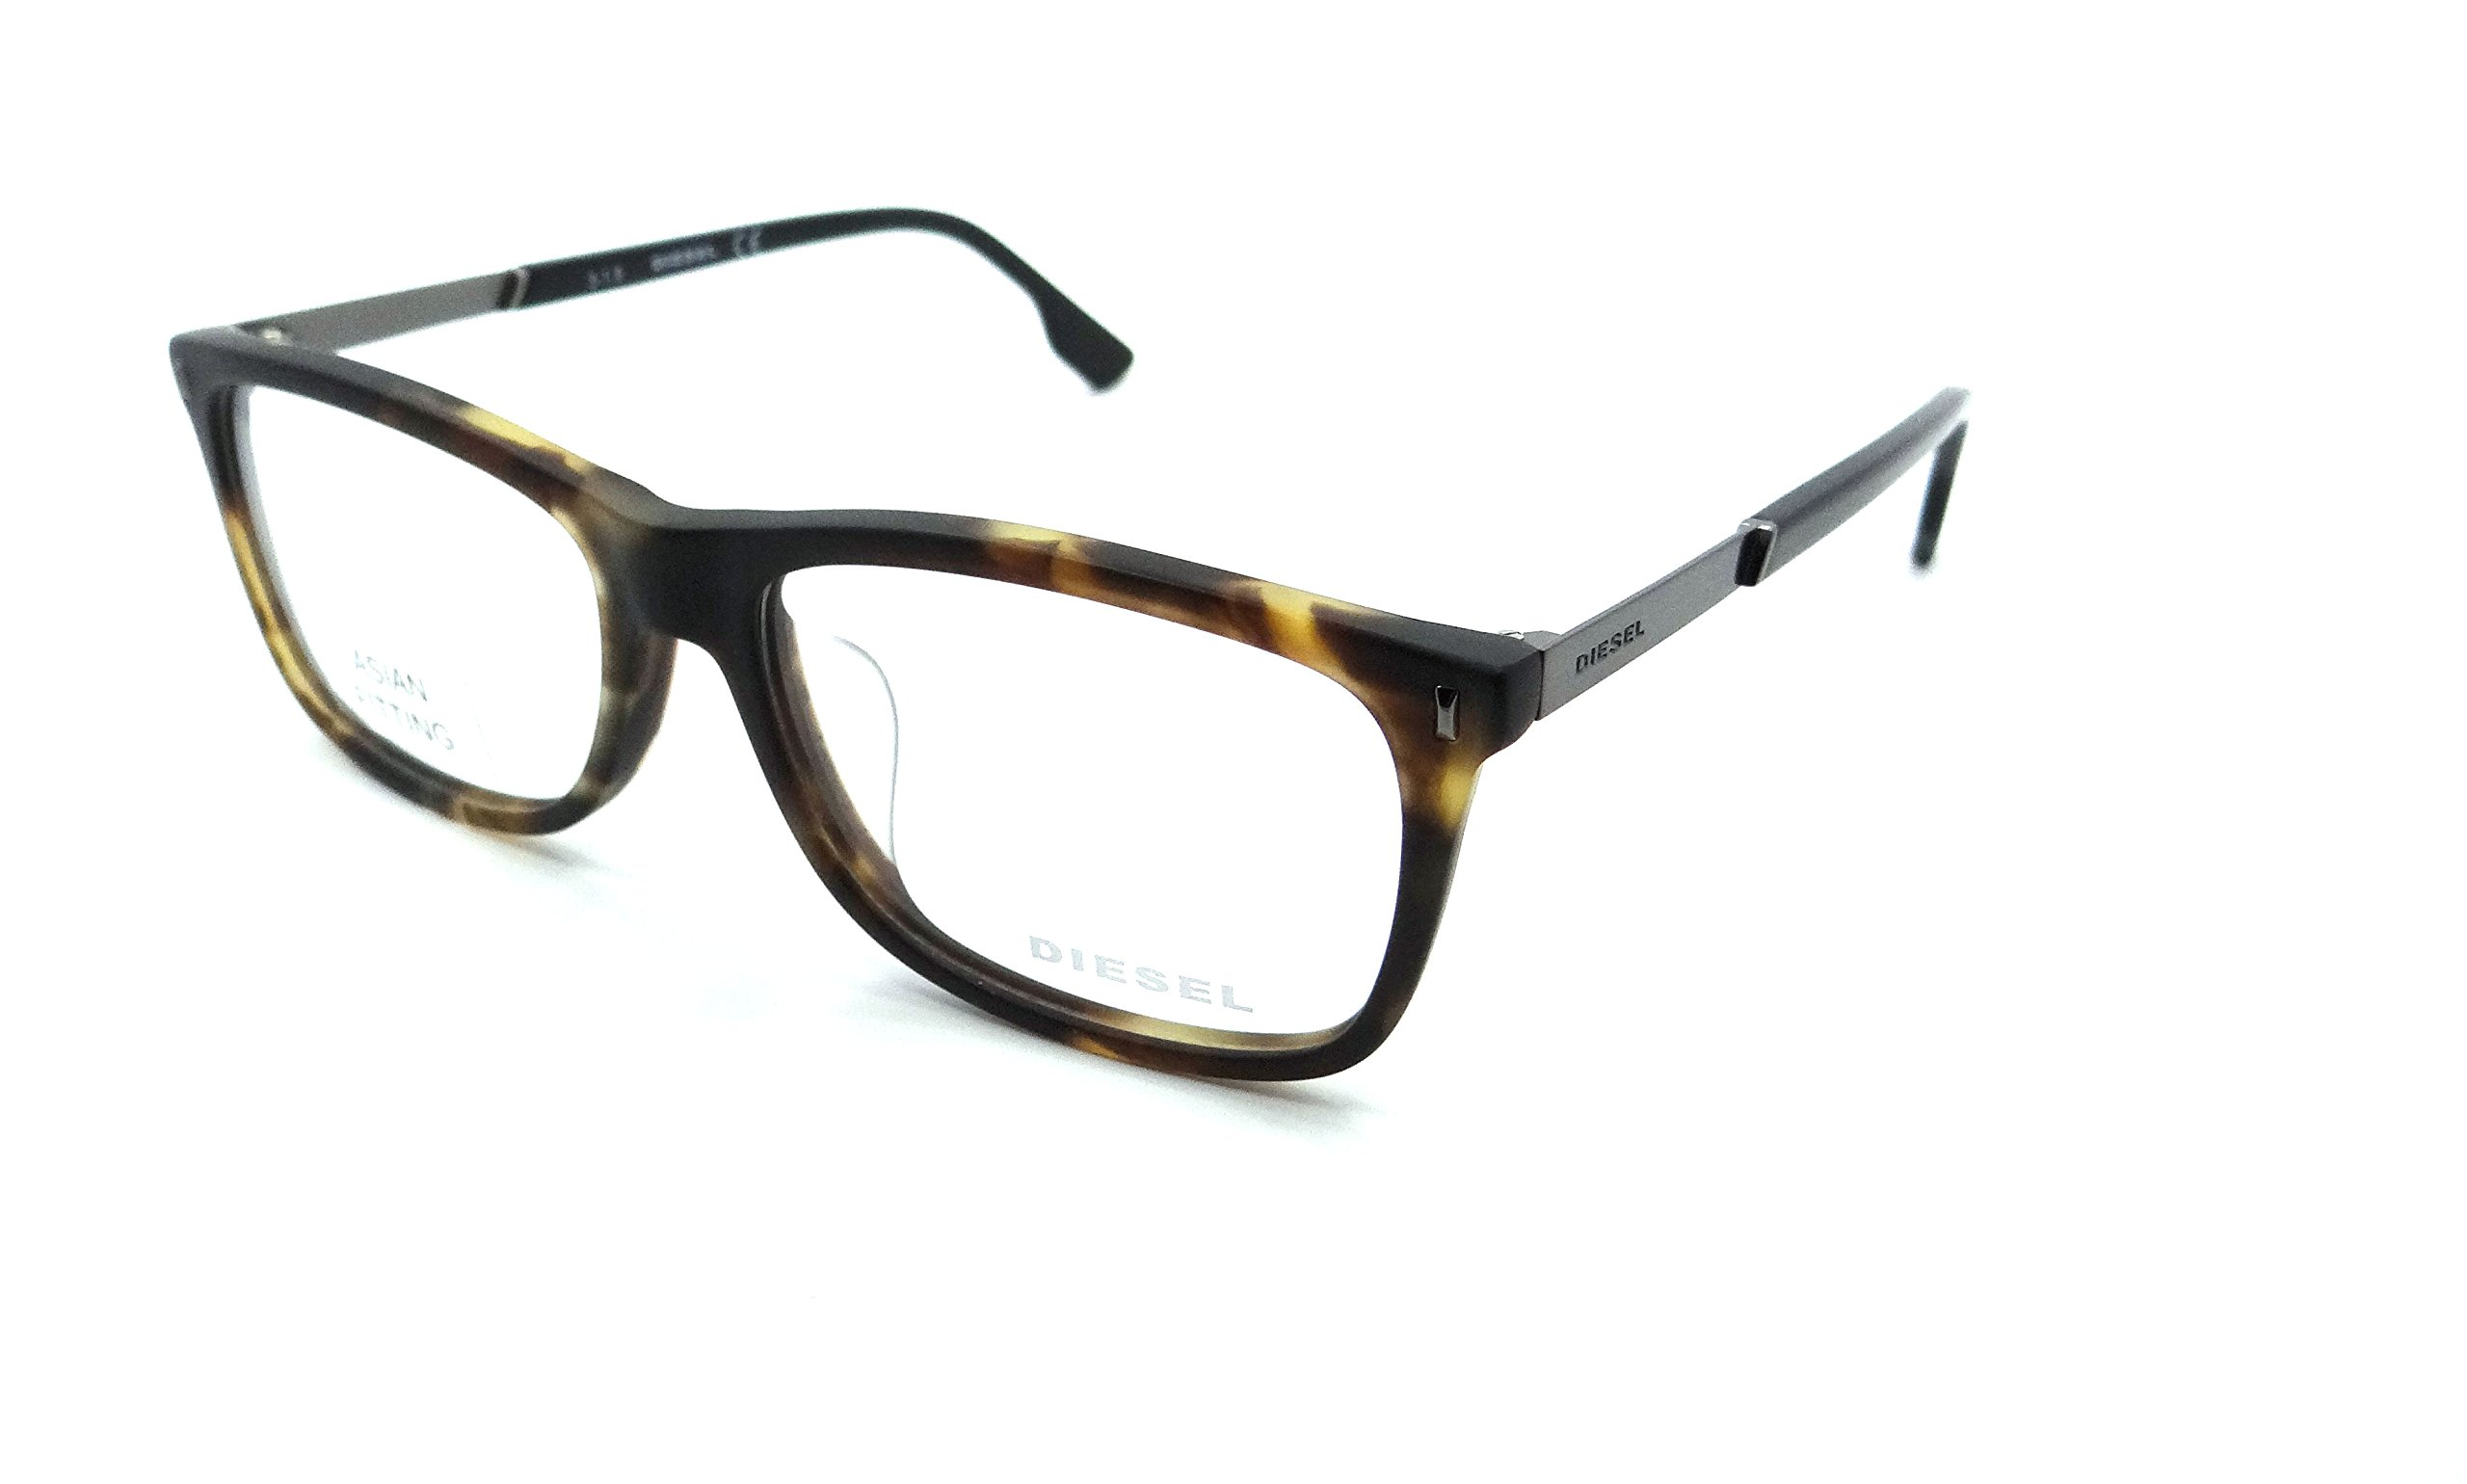 Diesel Rx Eyeglasses Frames DL5199-F 055 53-15-145 Matte Dark Havana Asian Fit